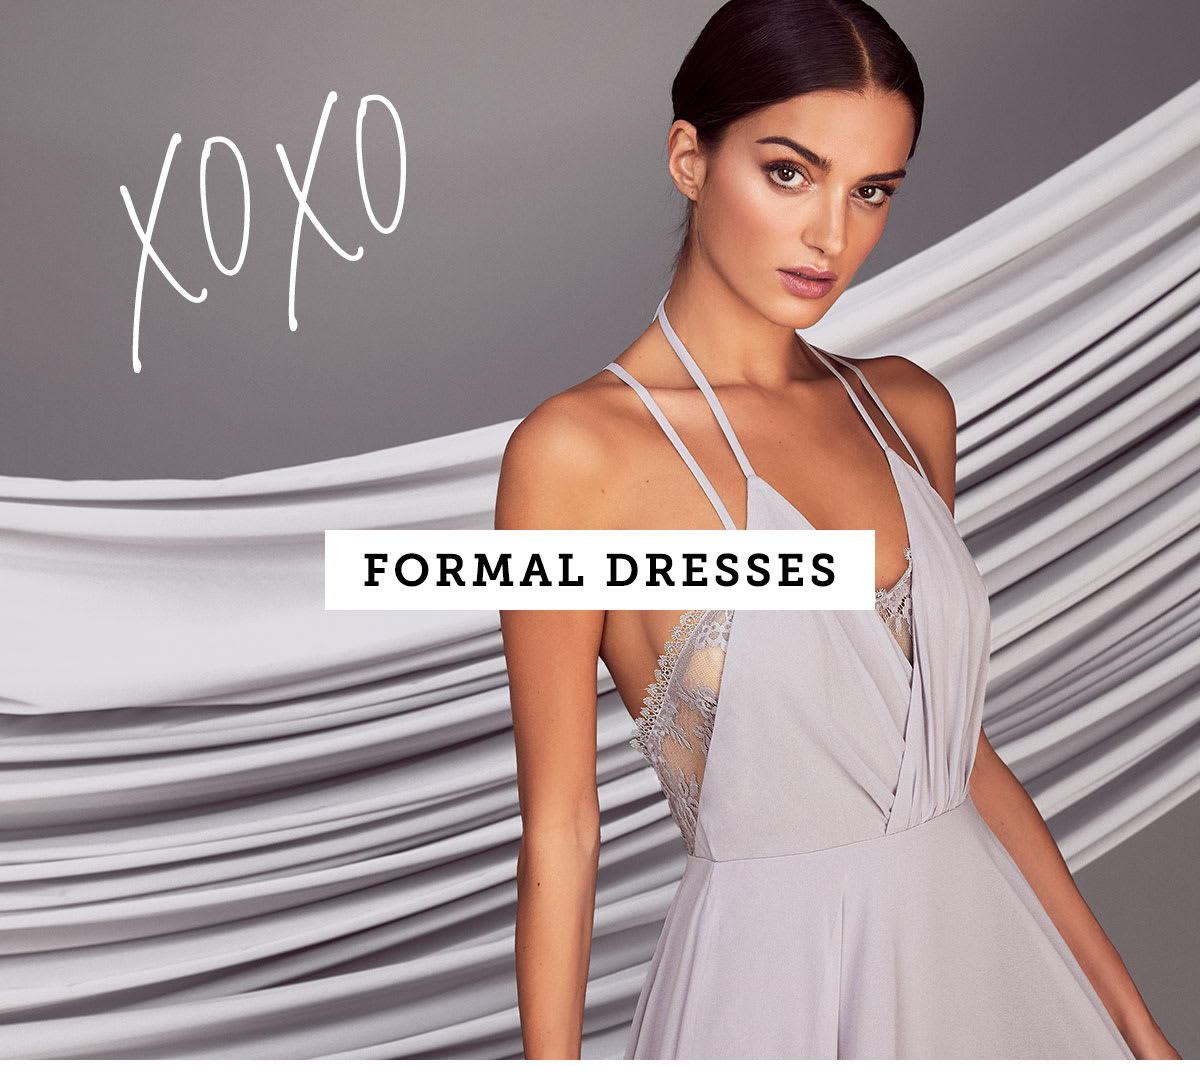 Shop Formal Dresses for Women.